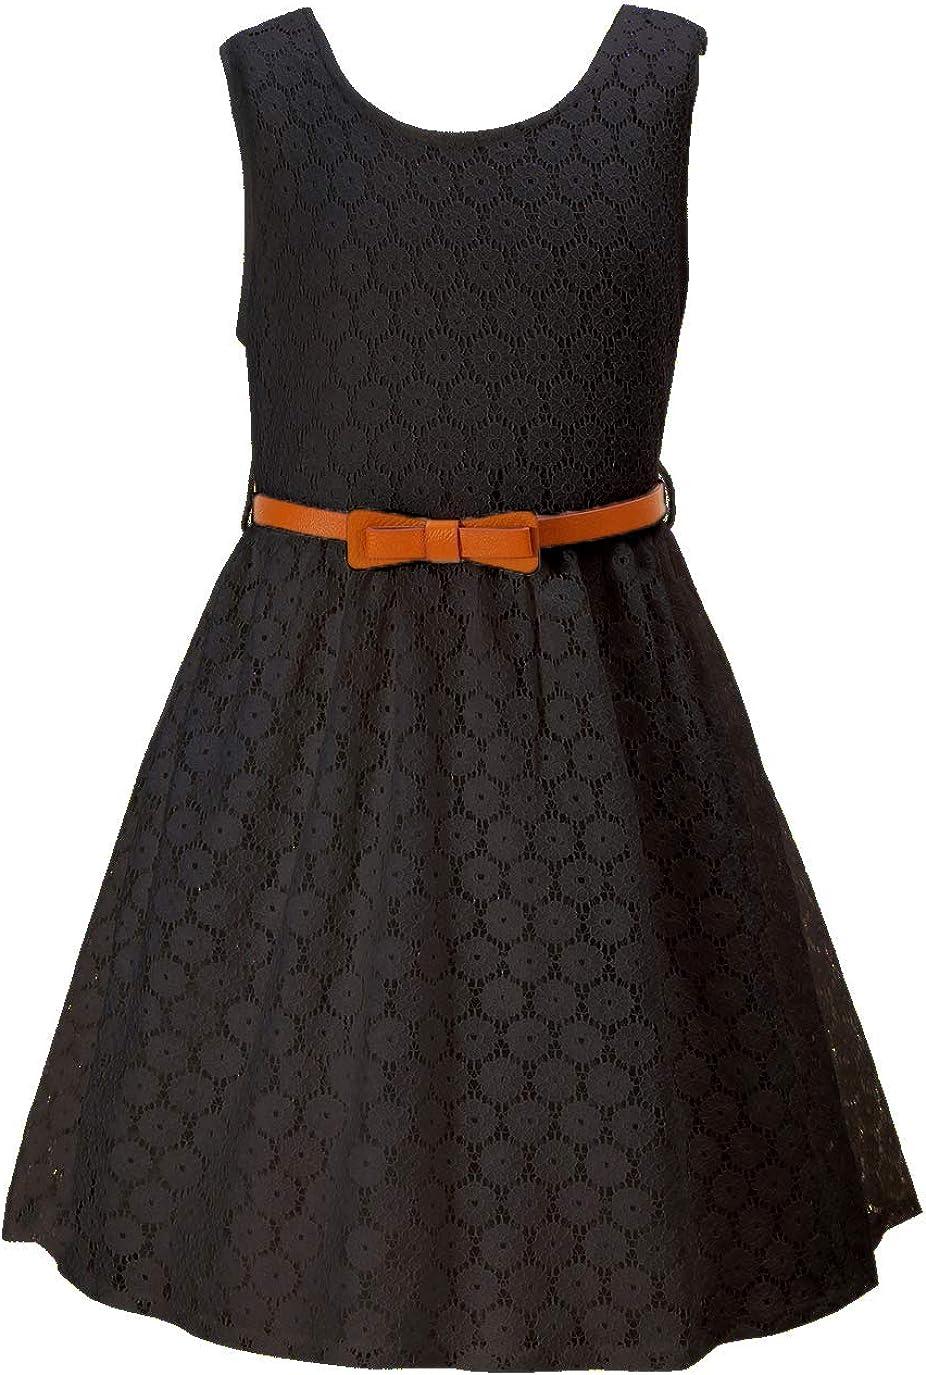 60s 70s Kids Costumes & Clothing Girls & Boys Girls Lace Dress Kids Casual Flower Girl Dress  AT vintagedancer.com